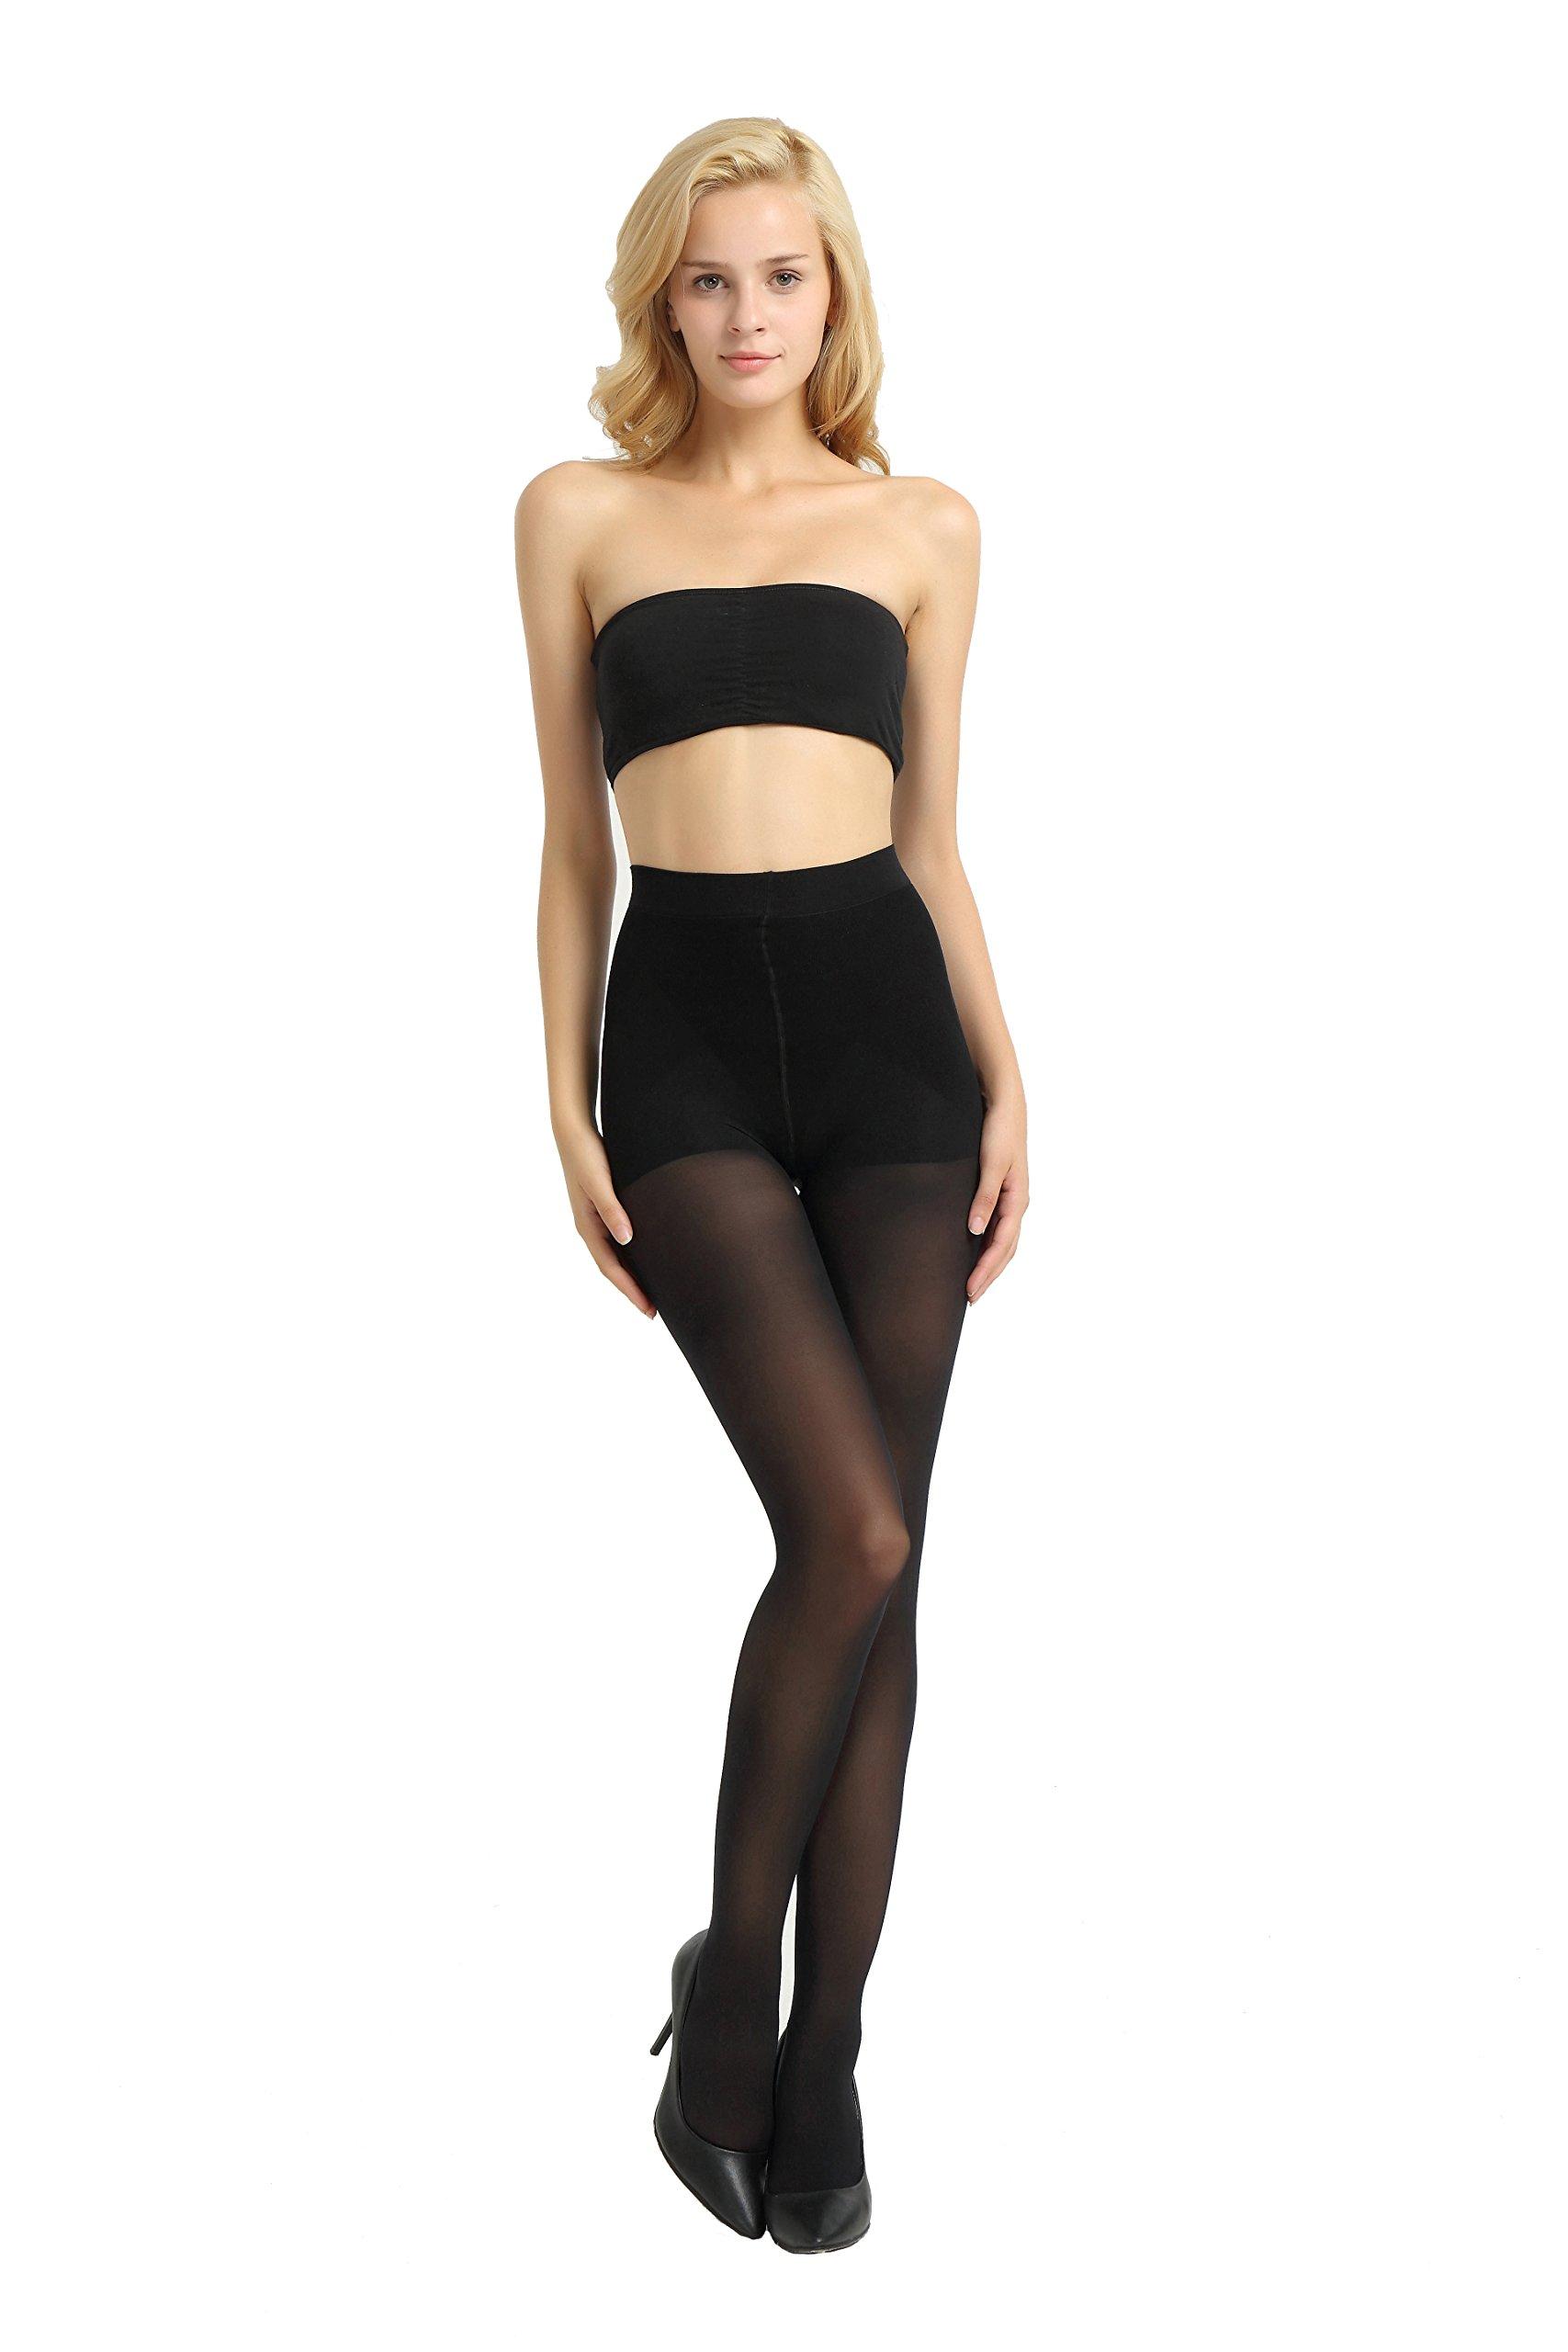 Alice & Belle Women's 40 Den superfine fiber Control Top Pantyhose, super soft tights (X-Large, Black)